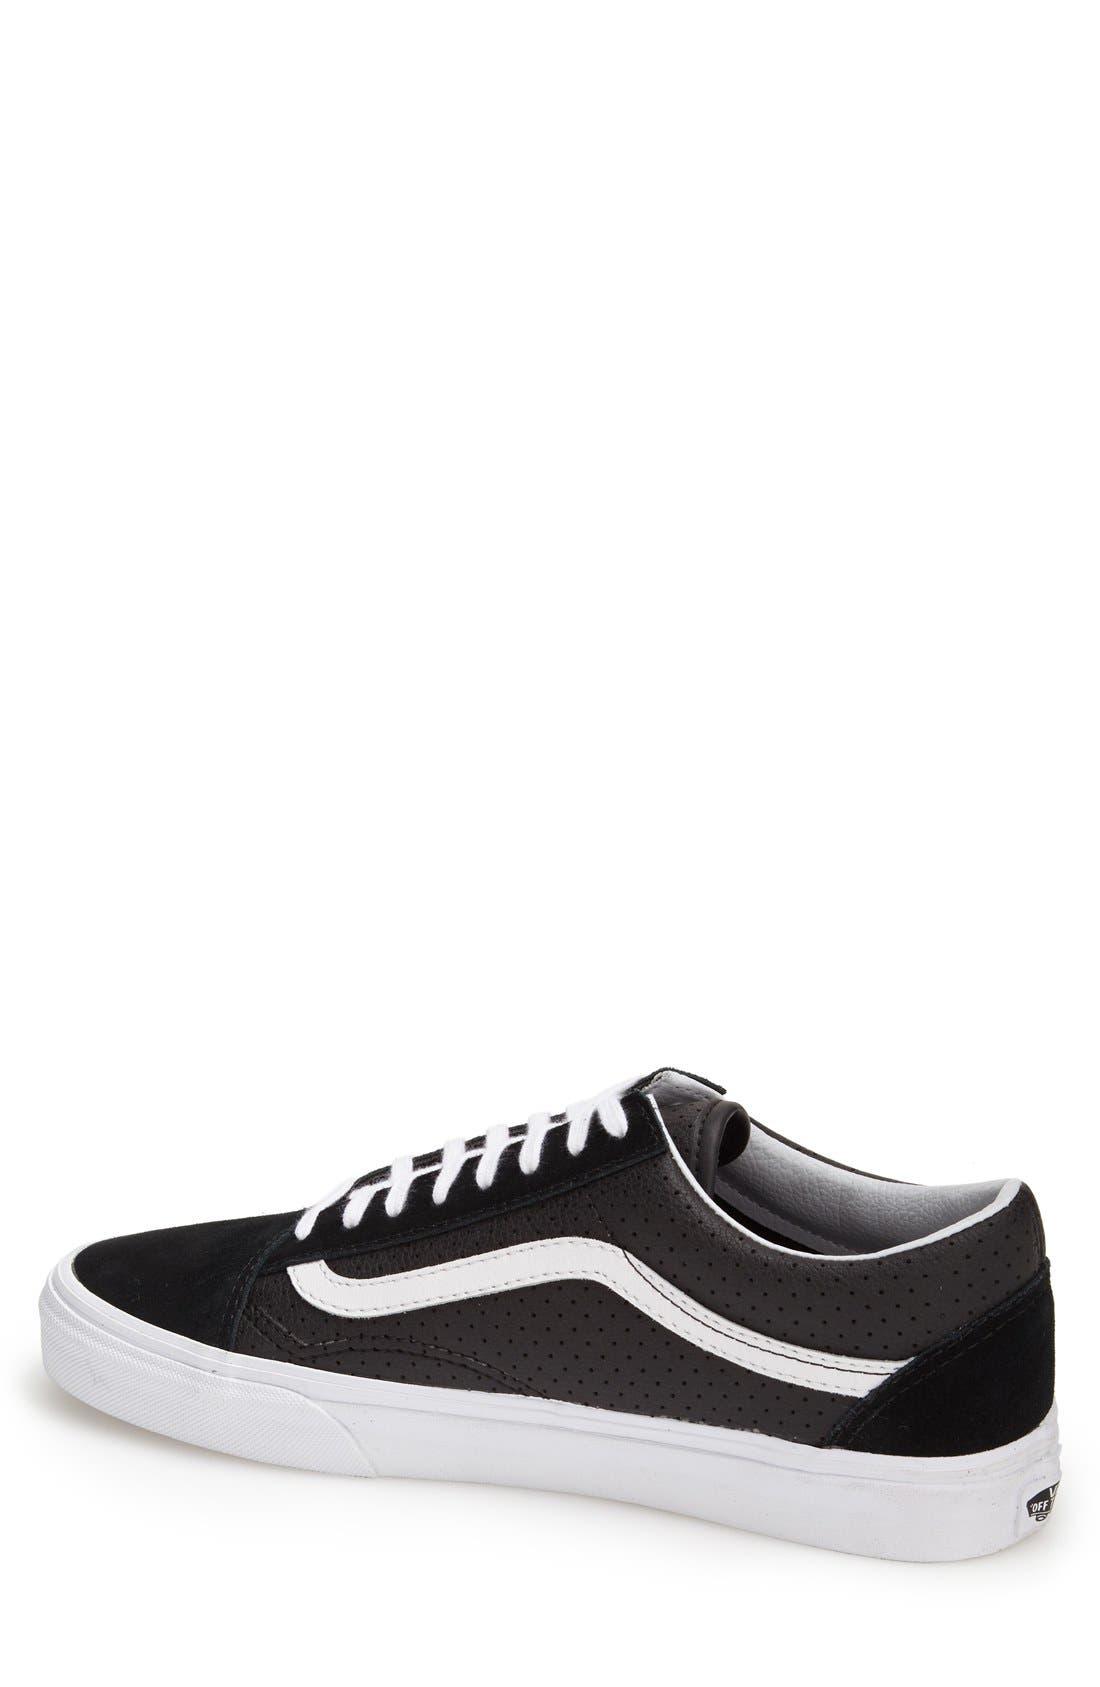 'Old Skool' Sneaker,                             Alternate thumbnail 4, color,